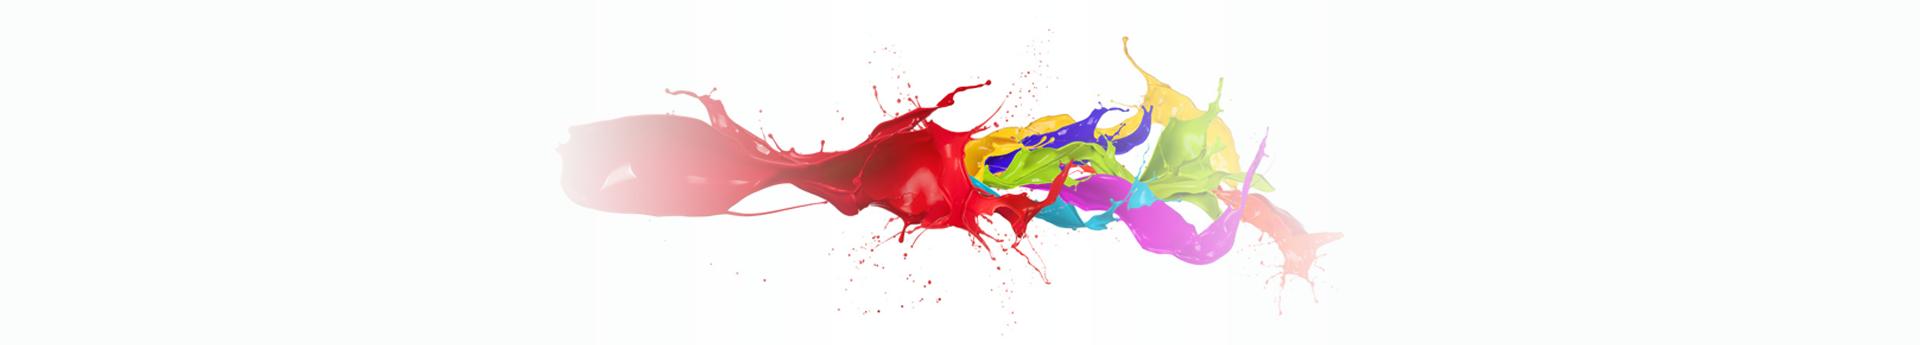 Farbe_ins_Spiel